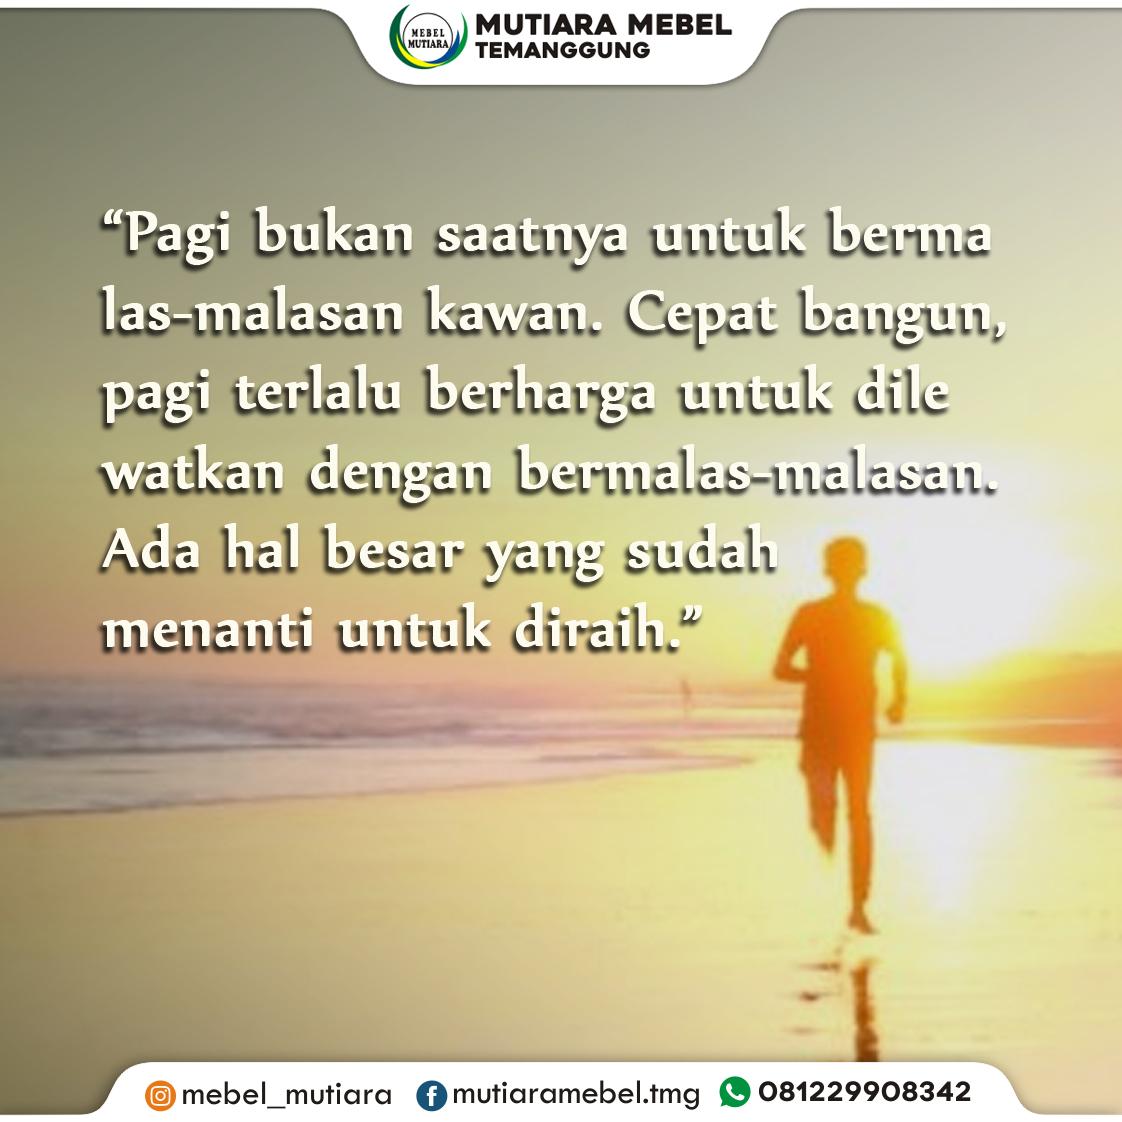 Selamat pagi.... #temanggung #magelang #wonosobo #tokomebeltemanggung #quotes #quotepagi